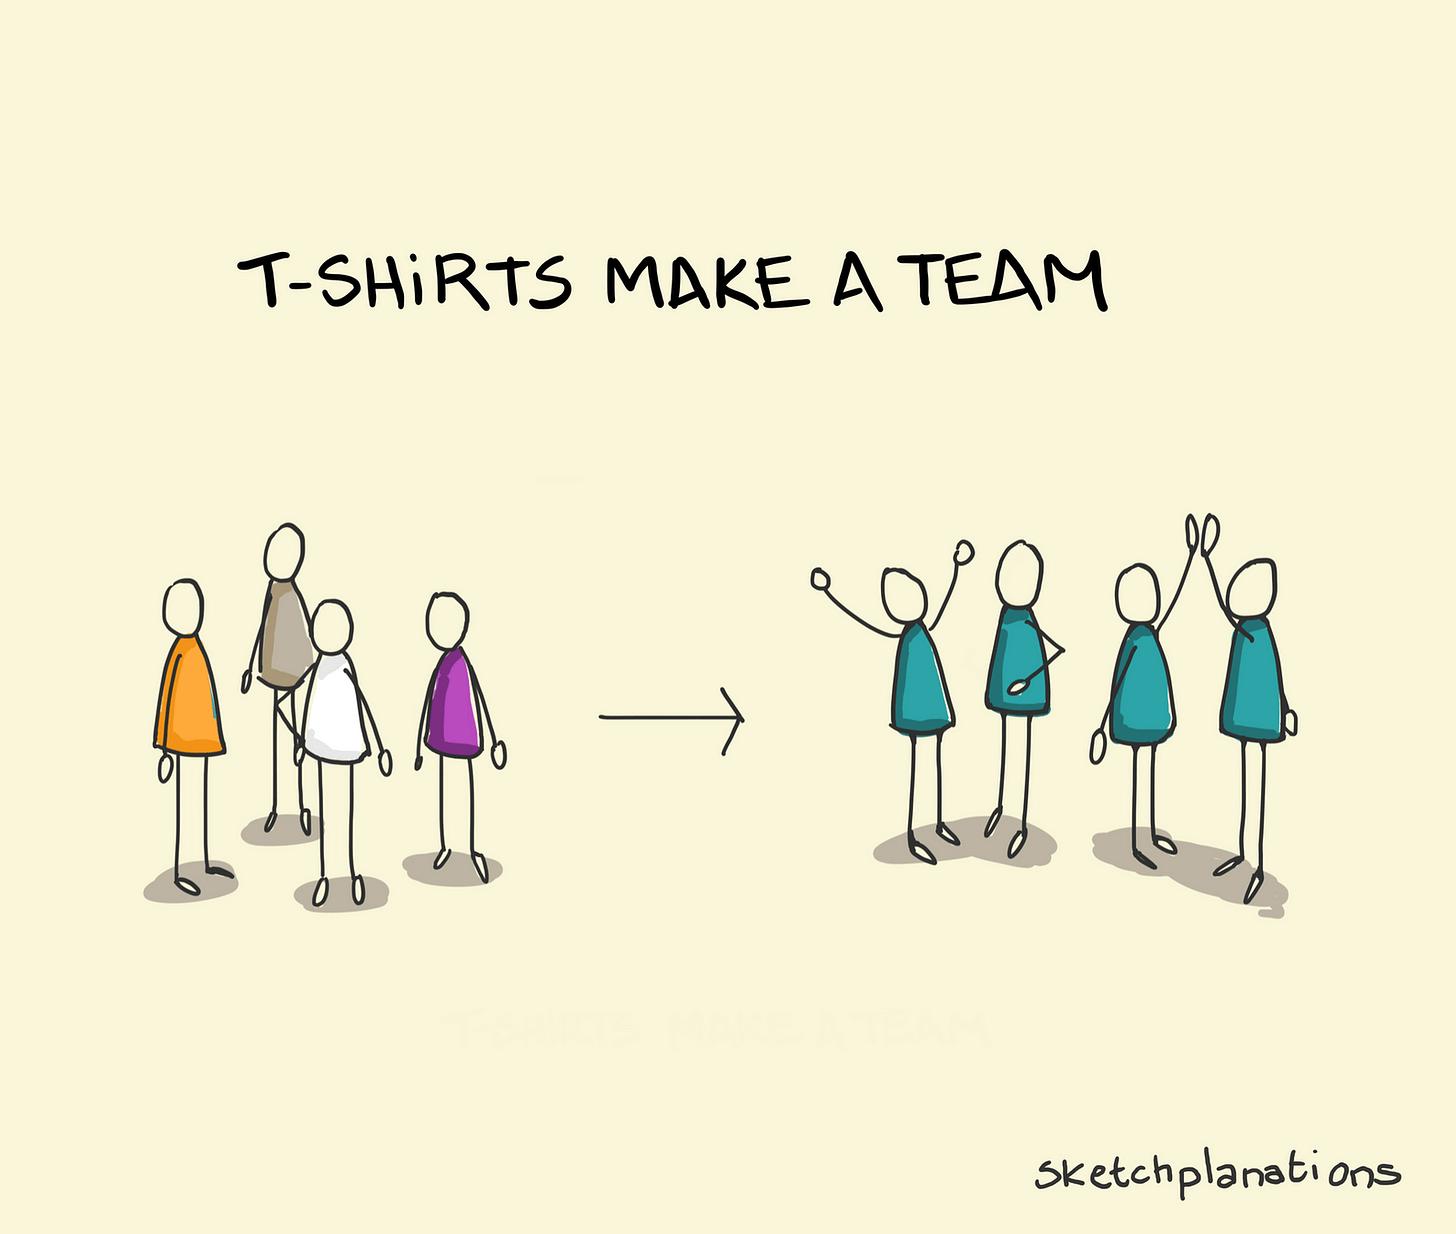 T-shirts make a team - Sketchplanations